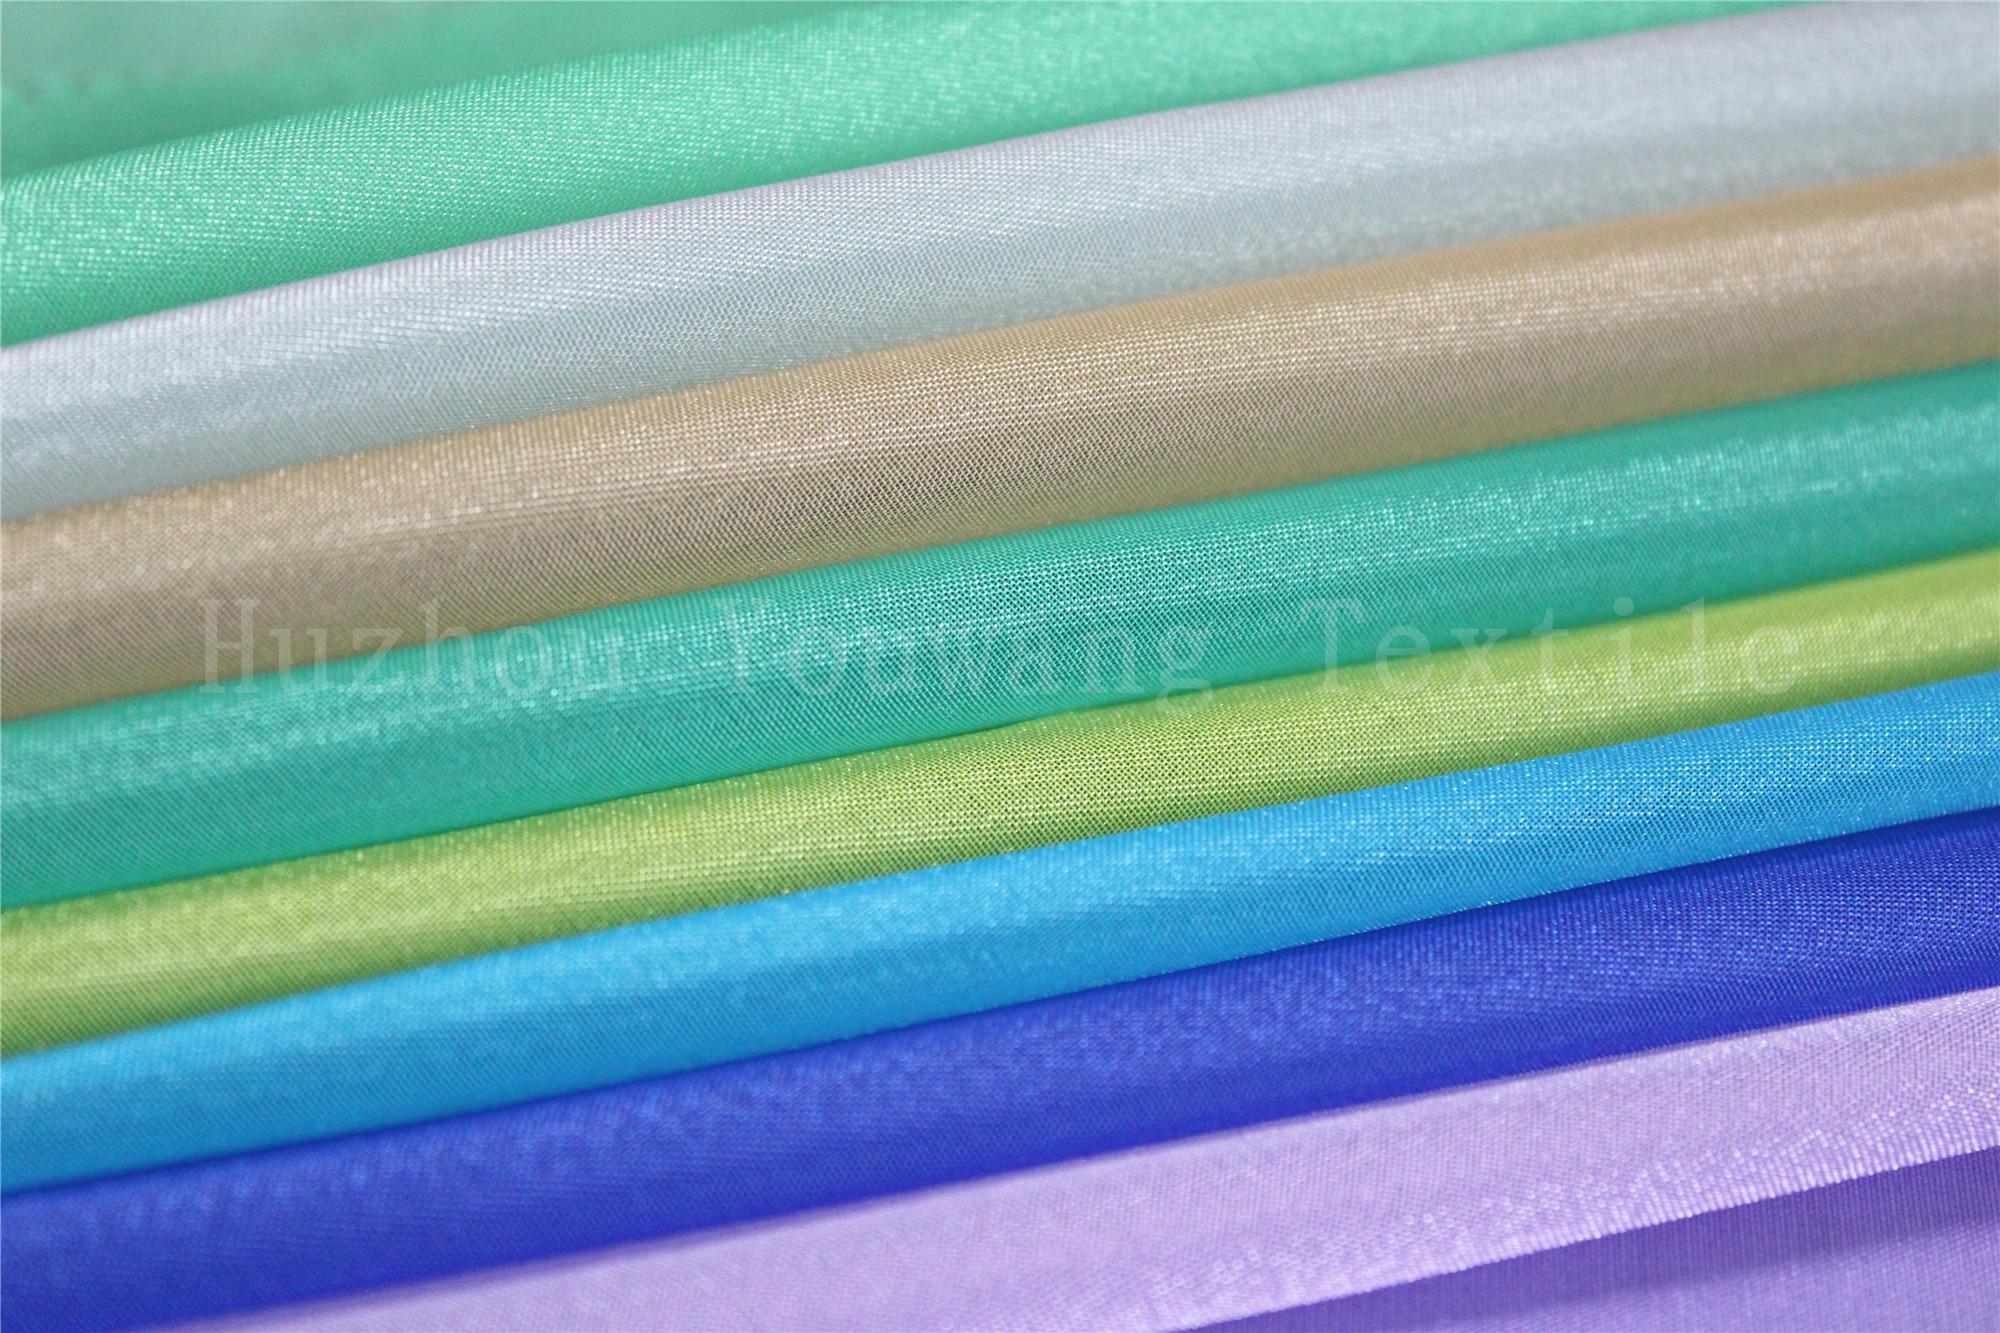 68D Crystal Organza Fabric 3